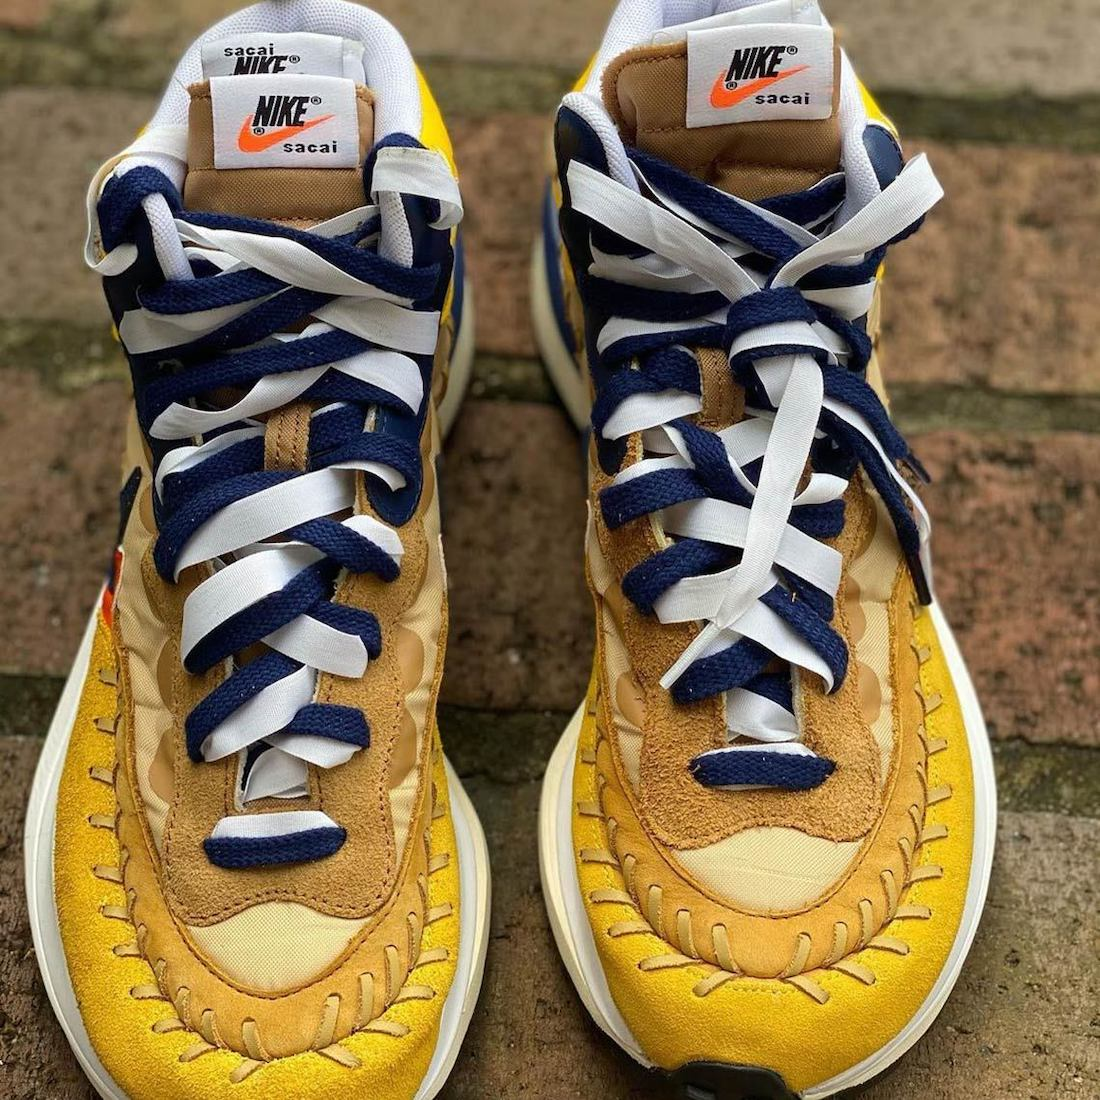 Sacai Jean Paul Gaultier Nike VaporWaffle Sesame DH9186-200 Release Date